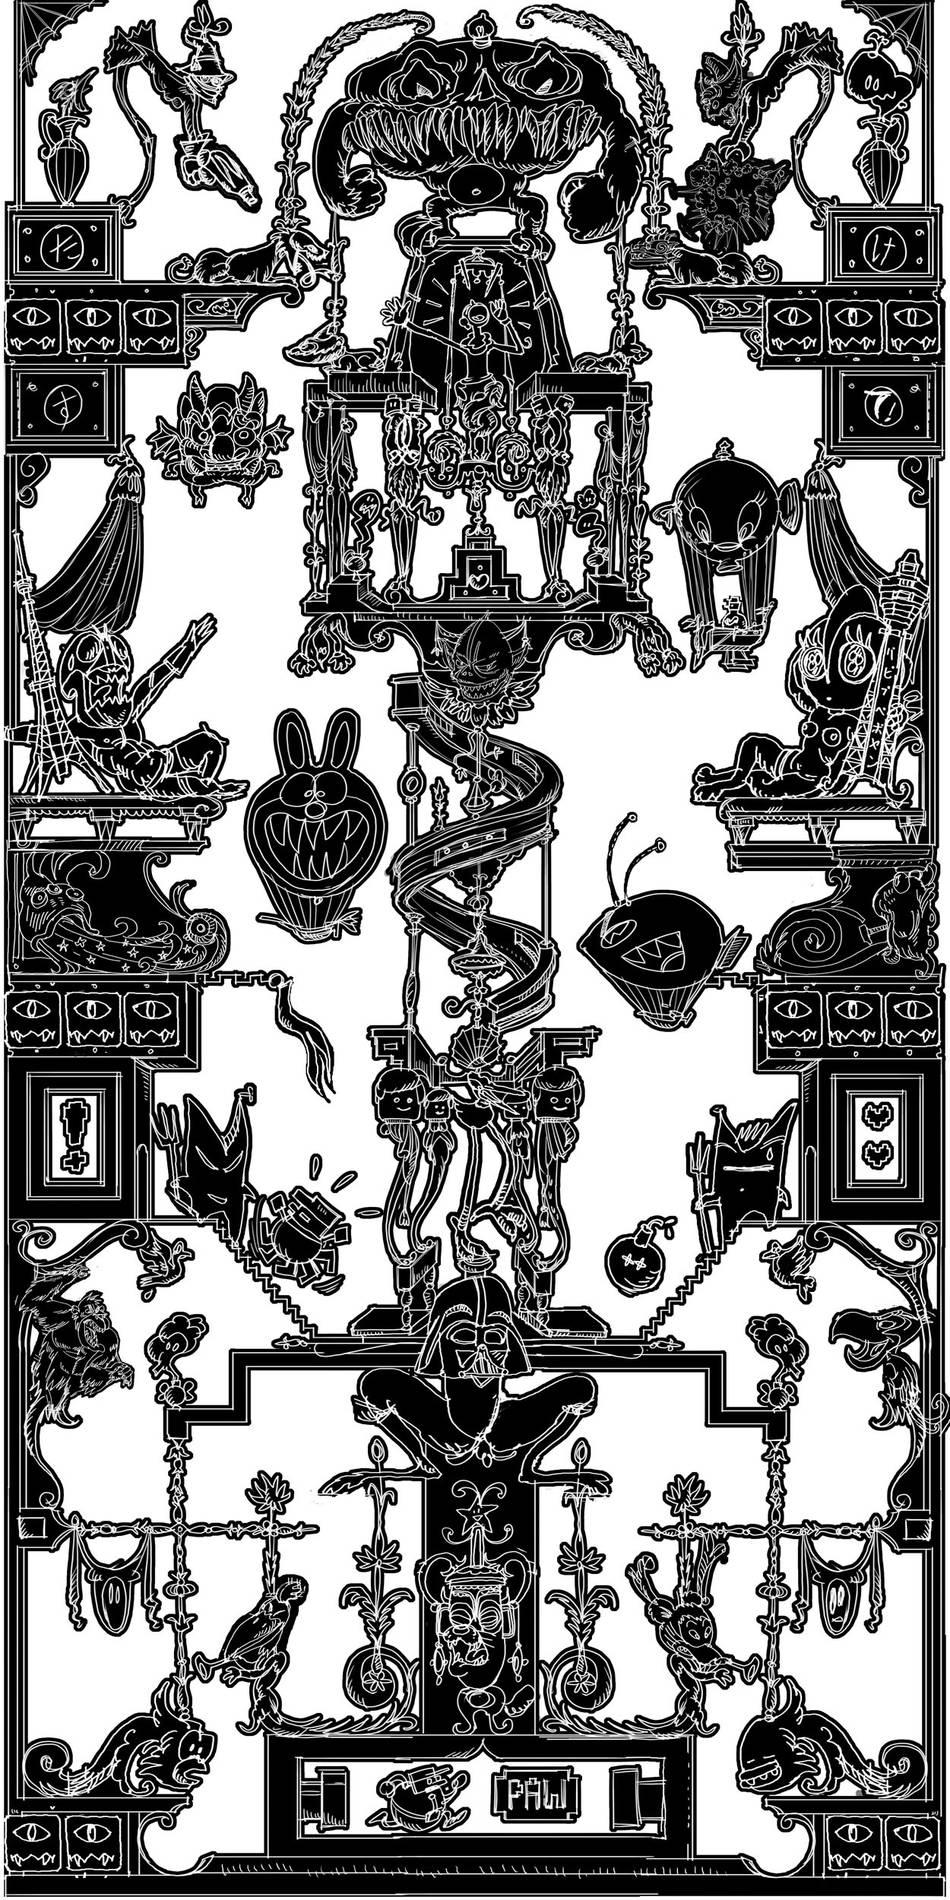 ·: Nicolas Buffe :· - Nicolas Buffe - 2010---01 - dessin_60x120cm_2500